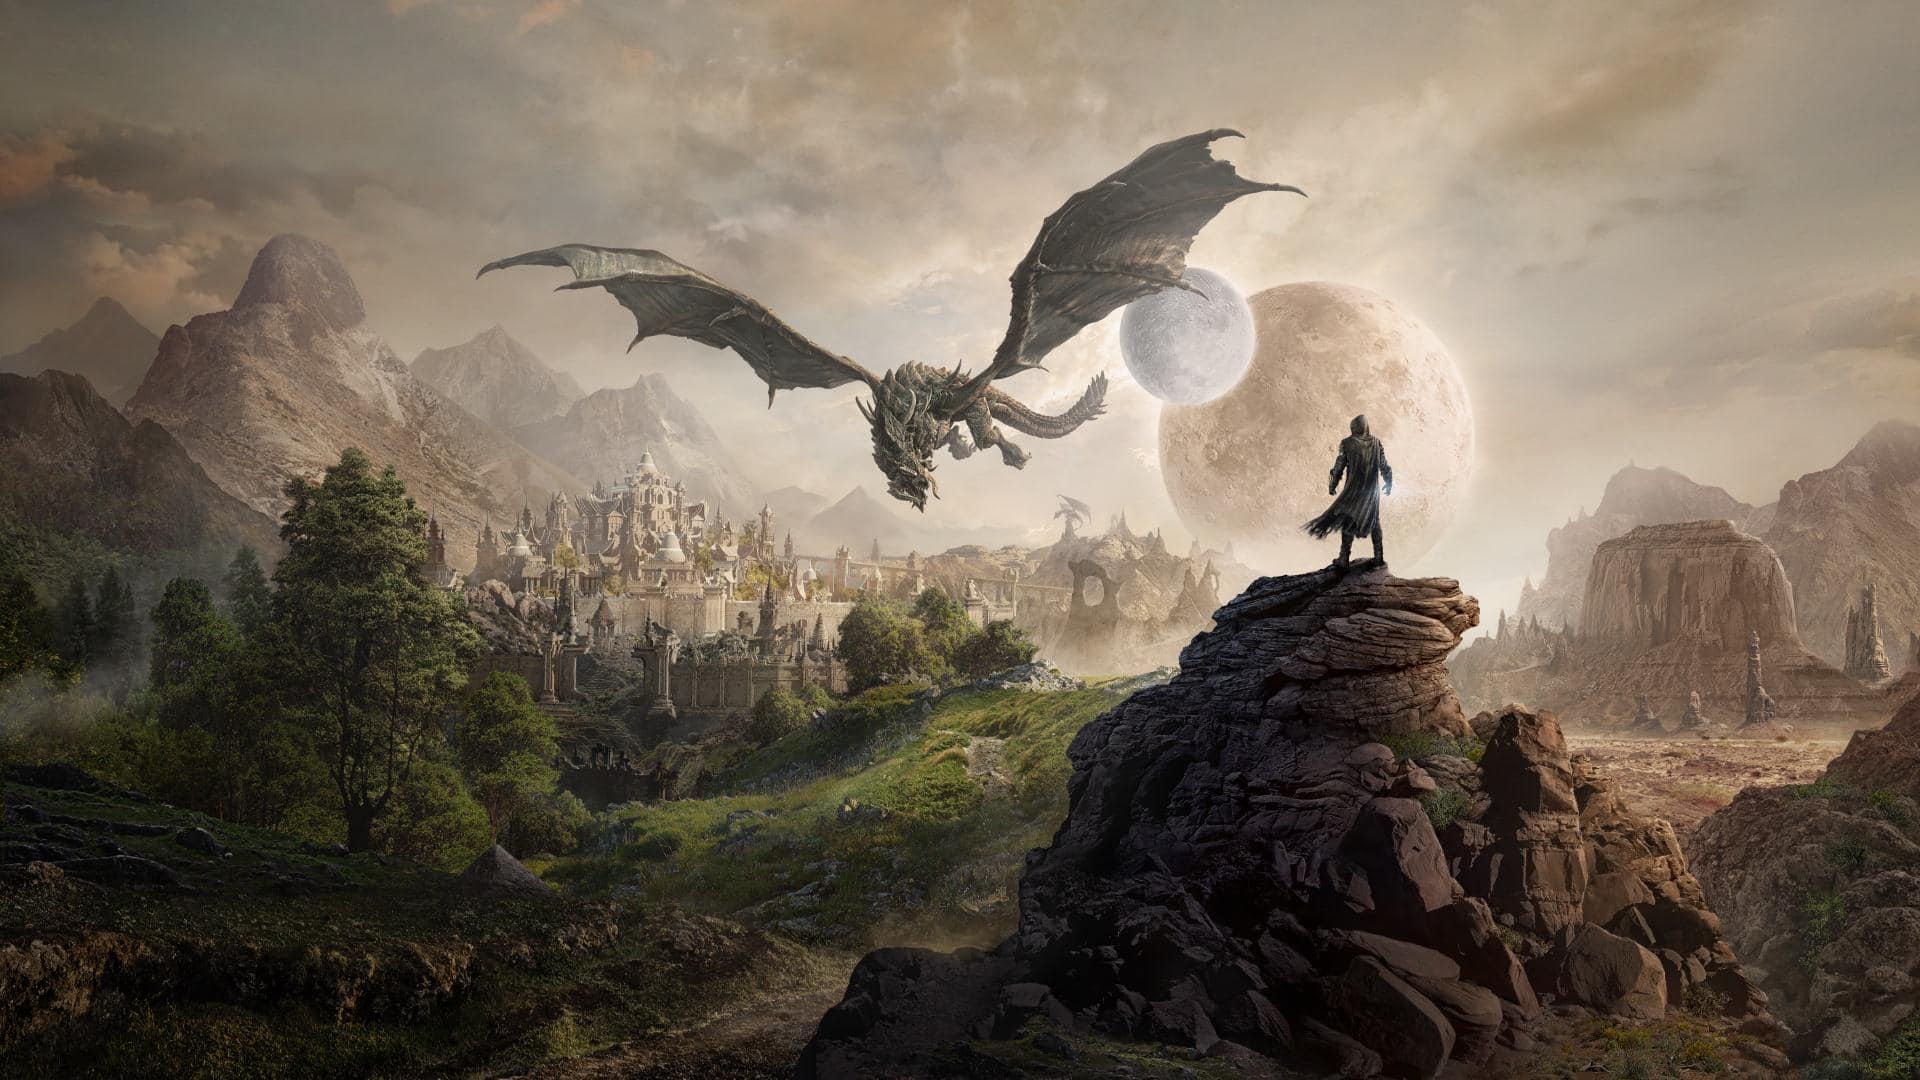 The Elder Scrolls Online story